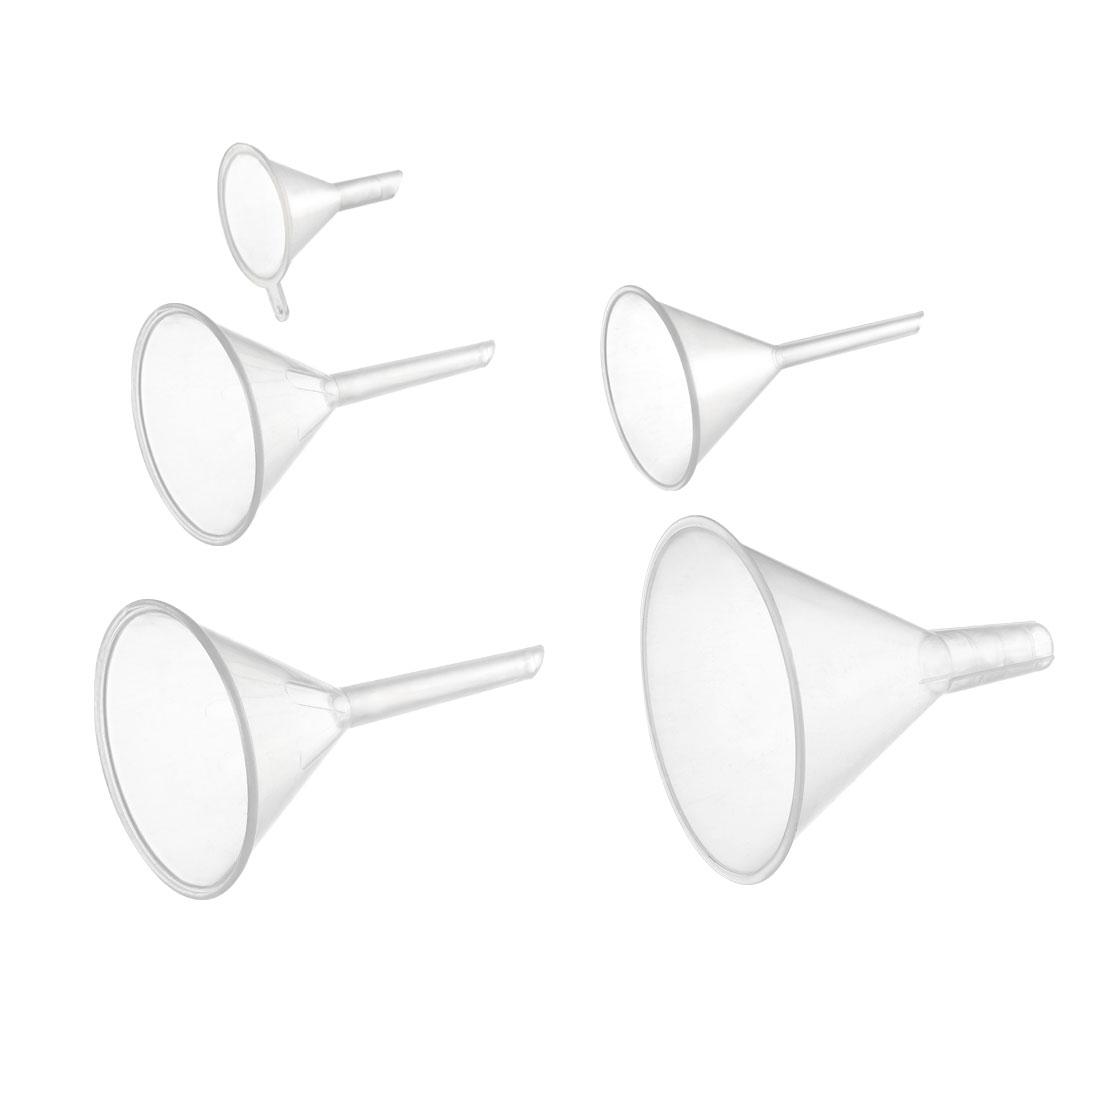 Clear Plastic Funnels Set Transfer Filling Tool for Filling Oils Laboratory